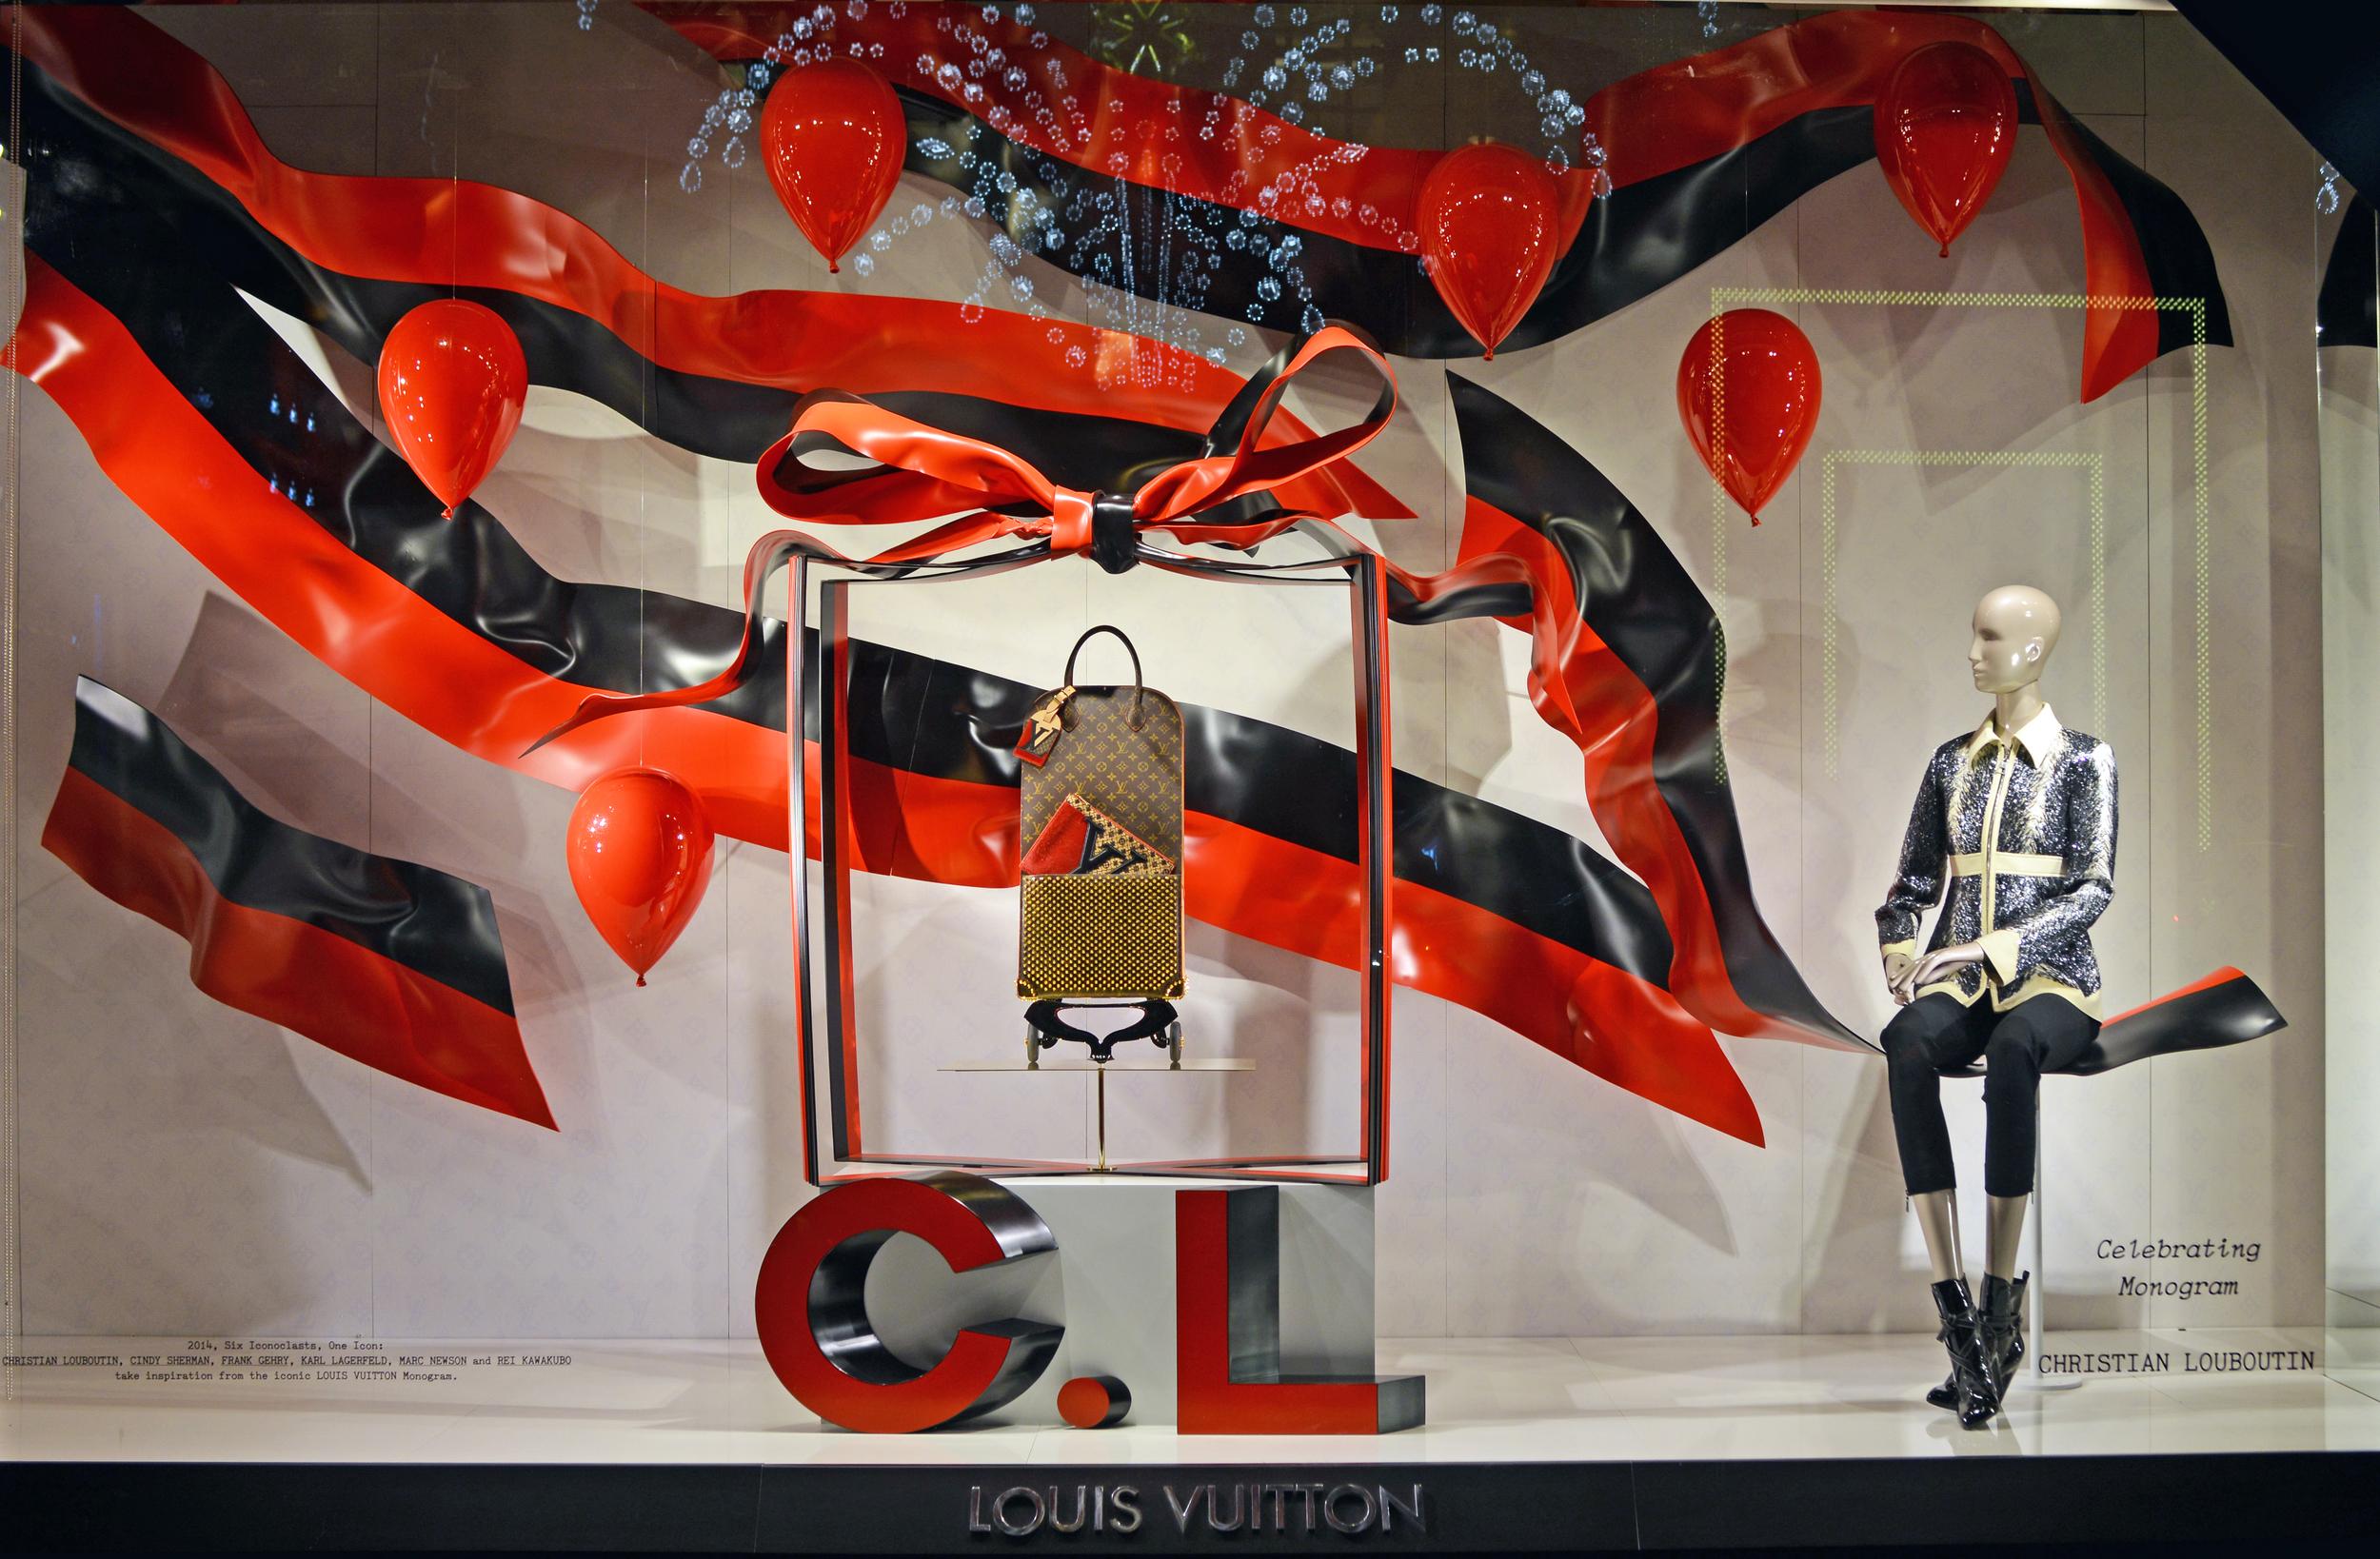 Window Display for Christian Louboutin - Louis Vuitton